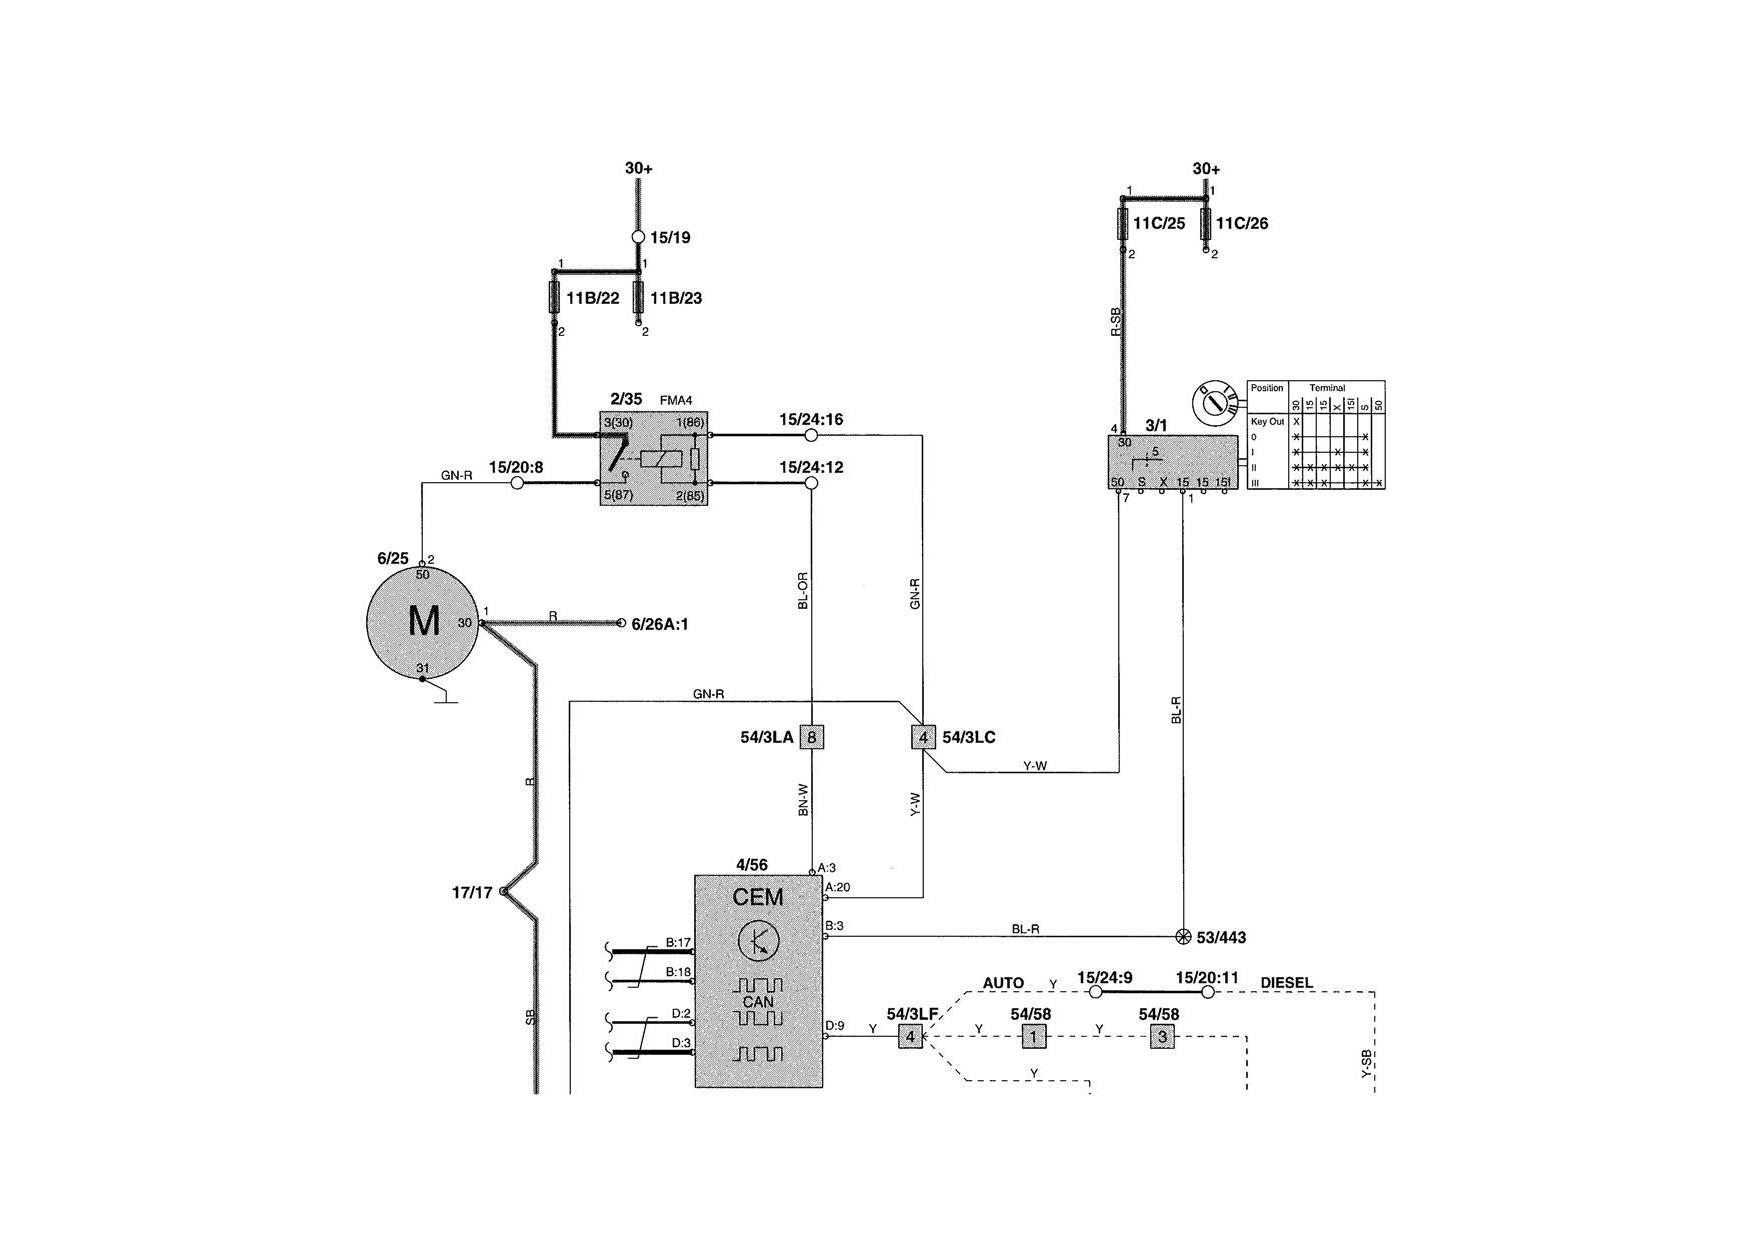 volvo truck radio wiring diagram wiring diagram 2003 ford ranger radio wiring diagram and schematic volvo truck wiring diagrams source